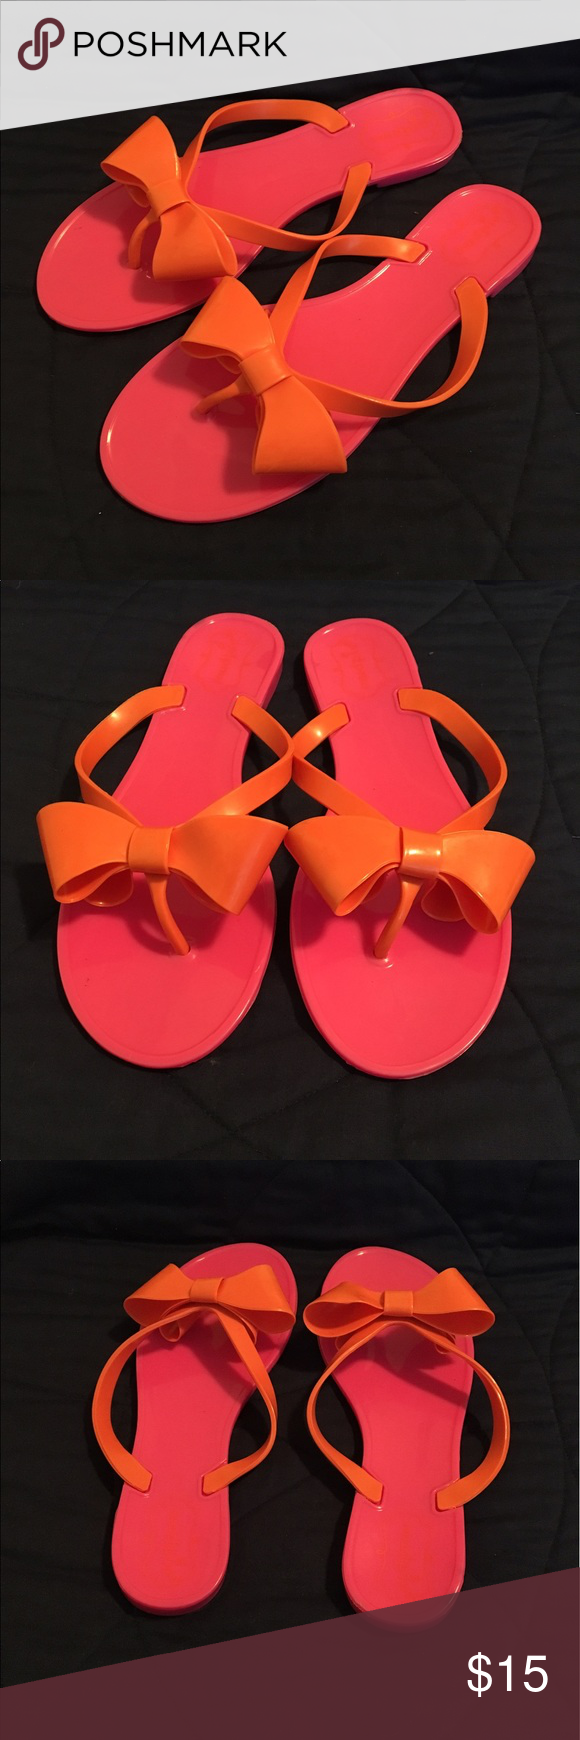 e543265cc924 Mud Pie bow jelly sandals